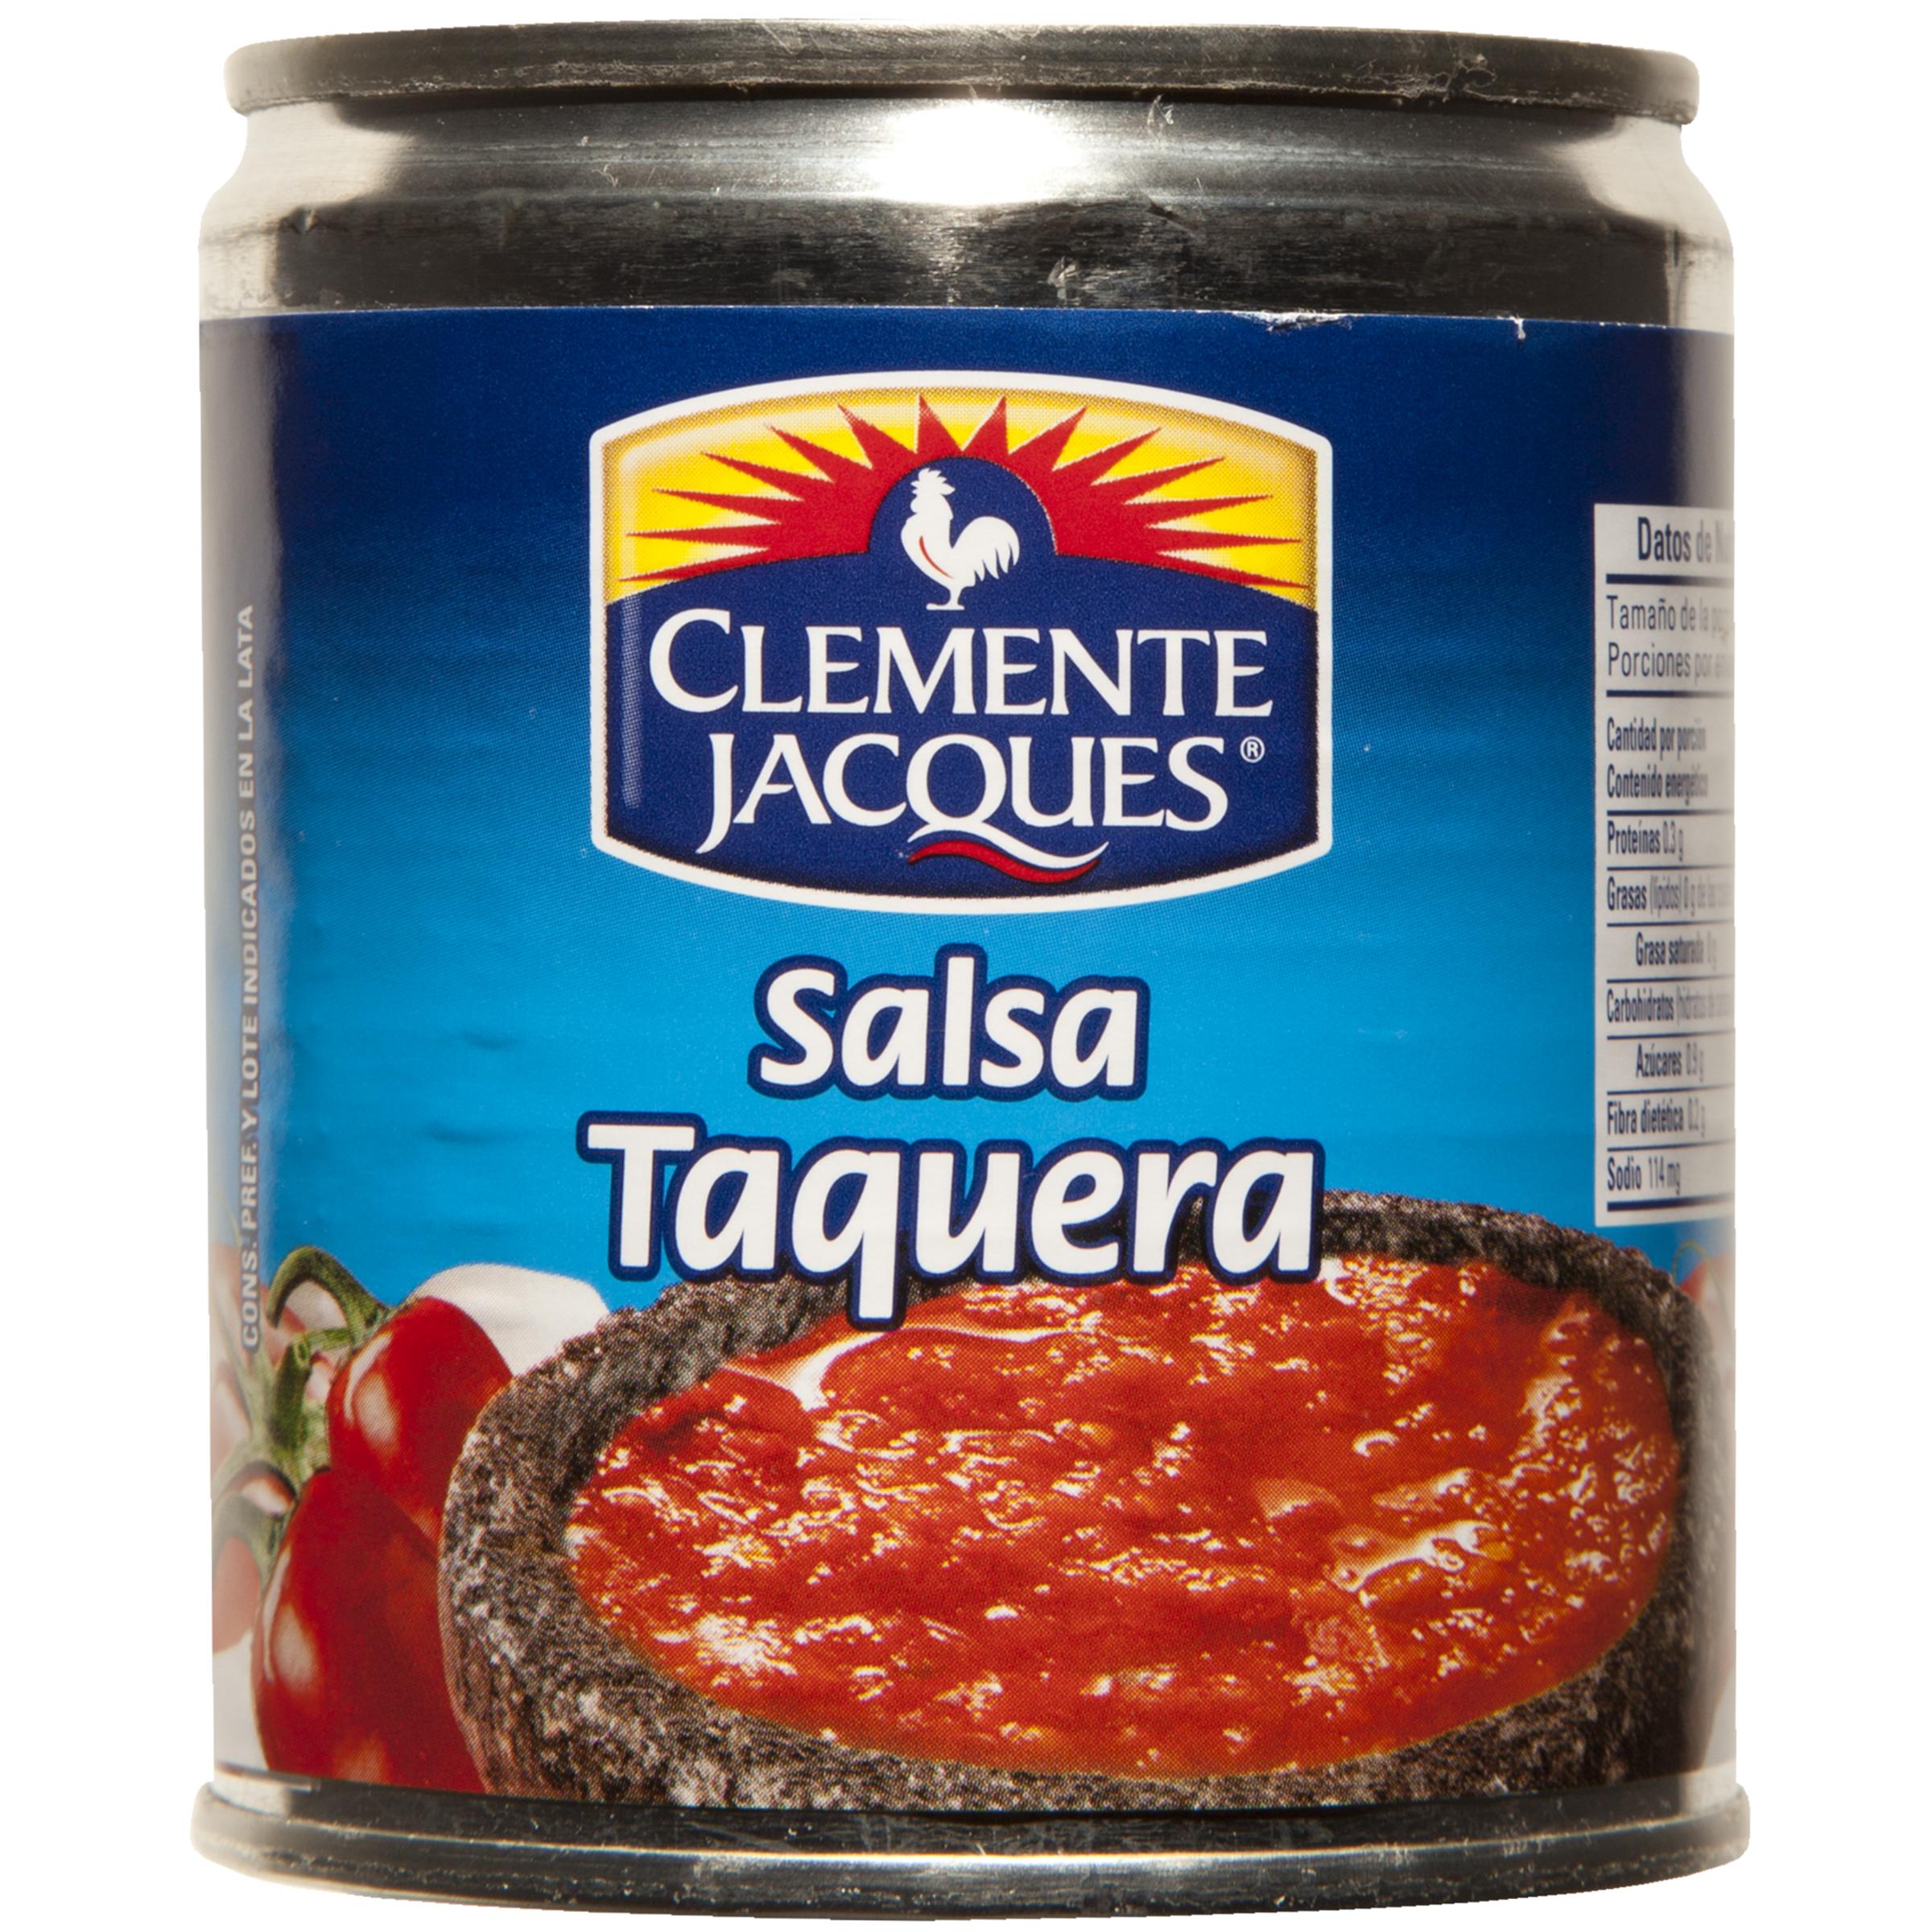 Salsa taquera 220ml clemente jacques 210g Lata